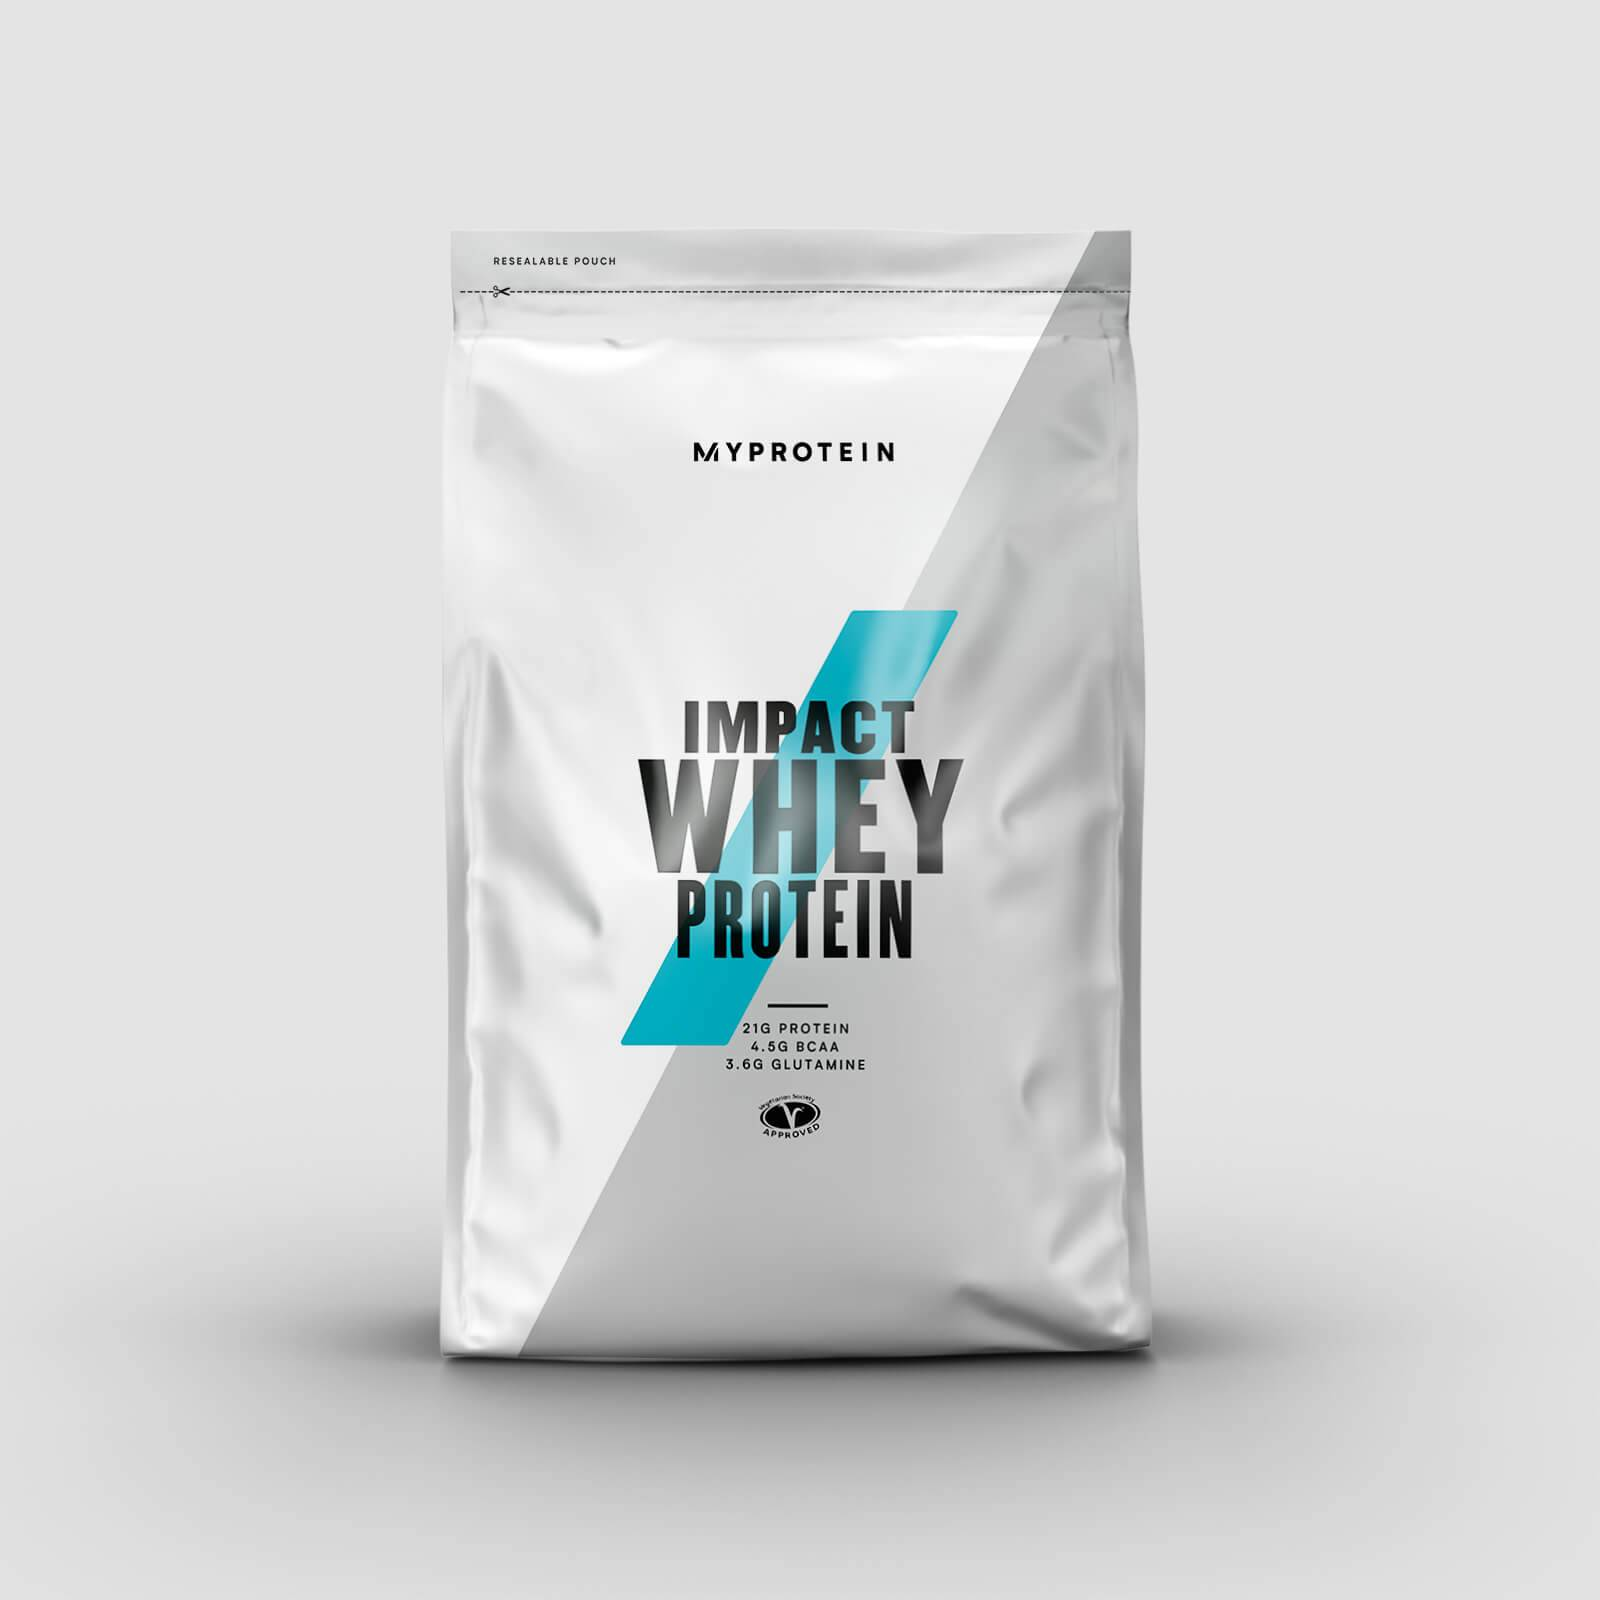 Myprotein Impact Whey Protein - 5kg - Chocolat-Noix de Coco